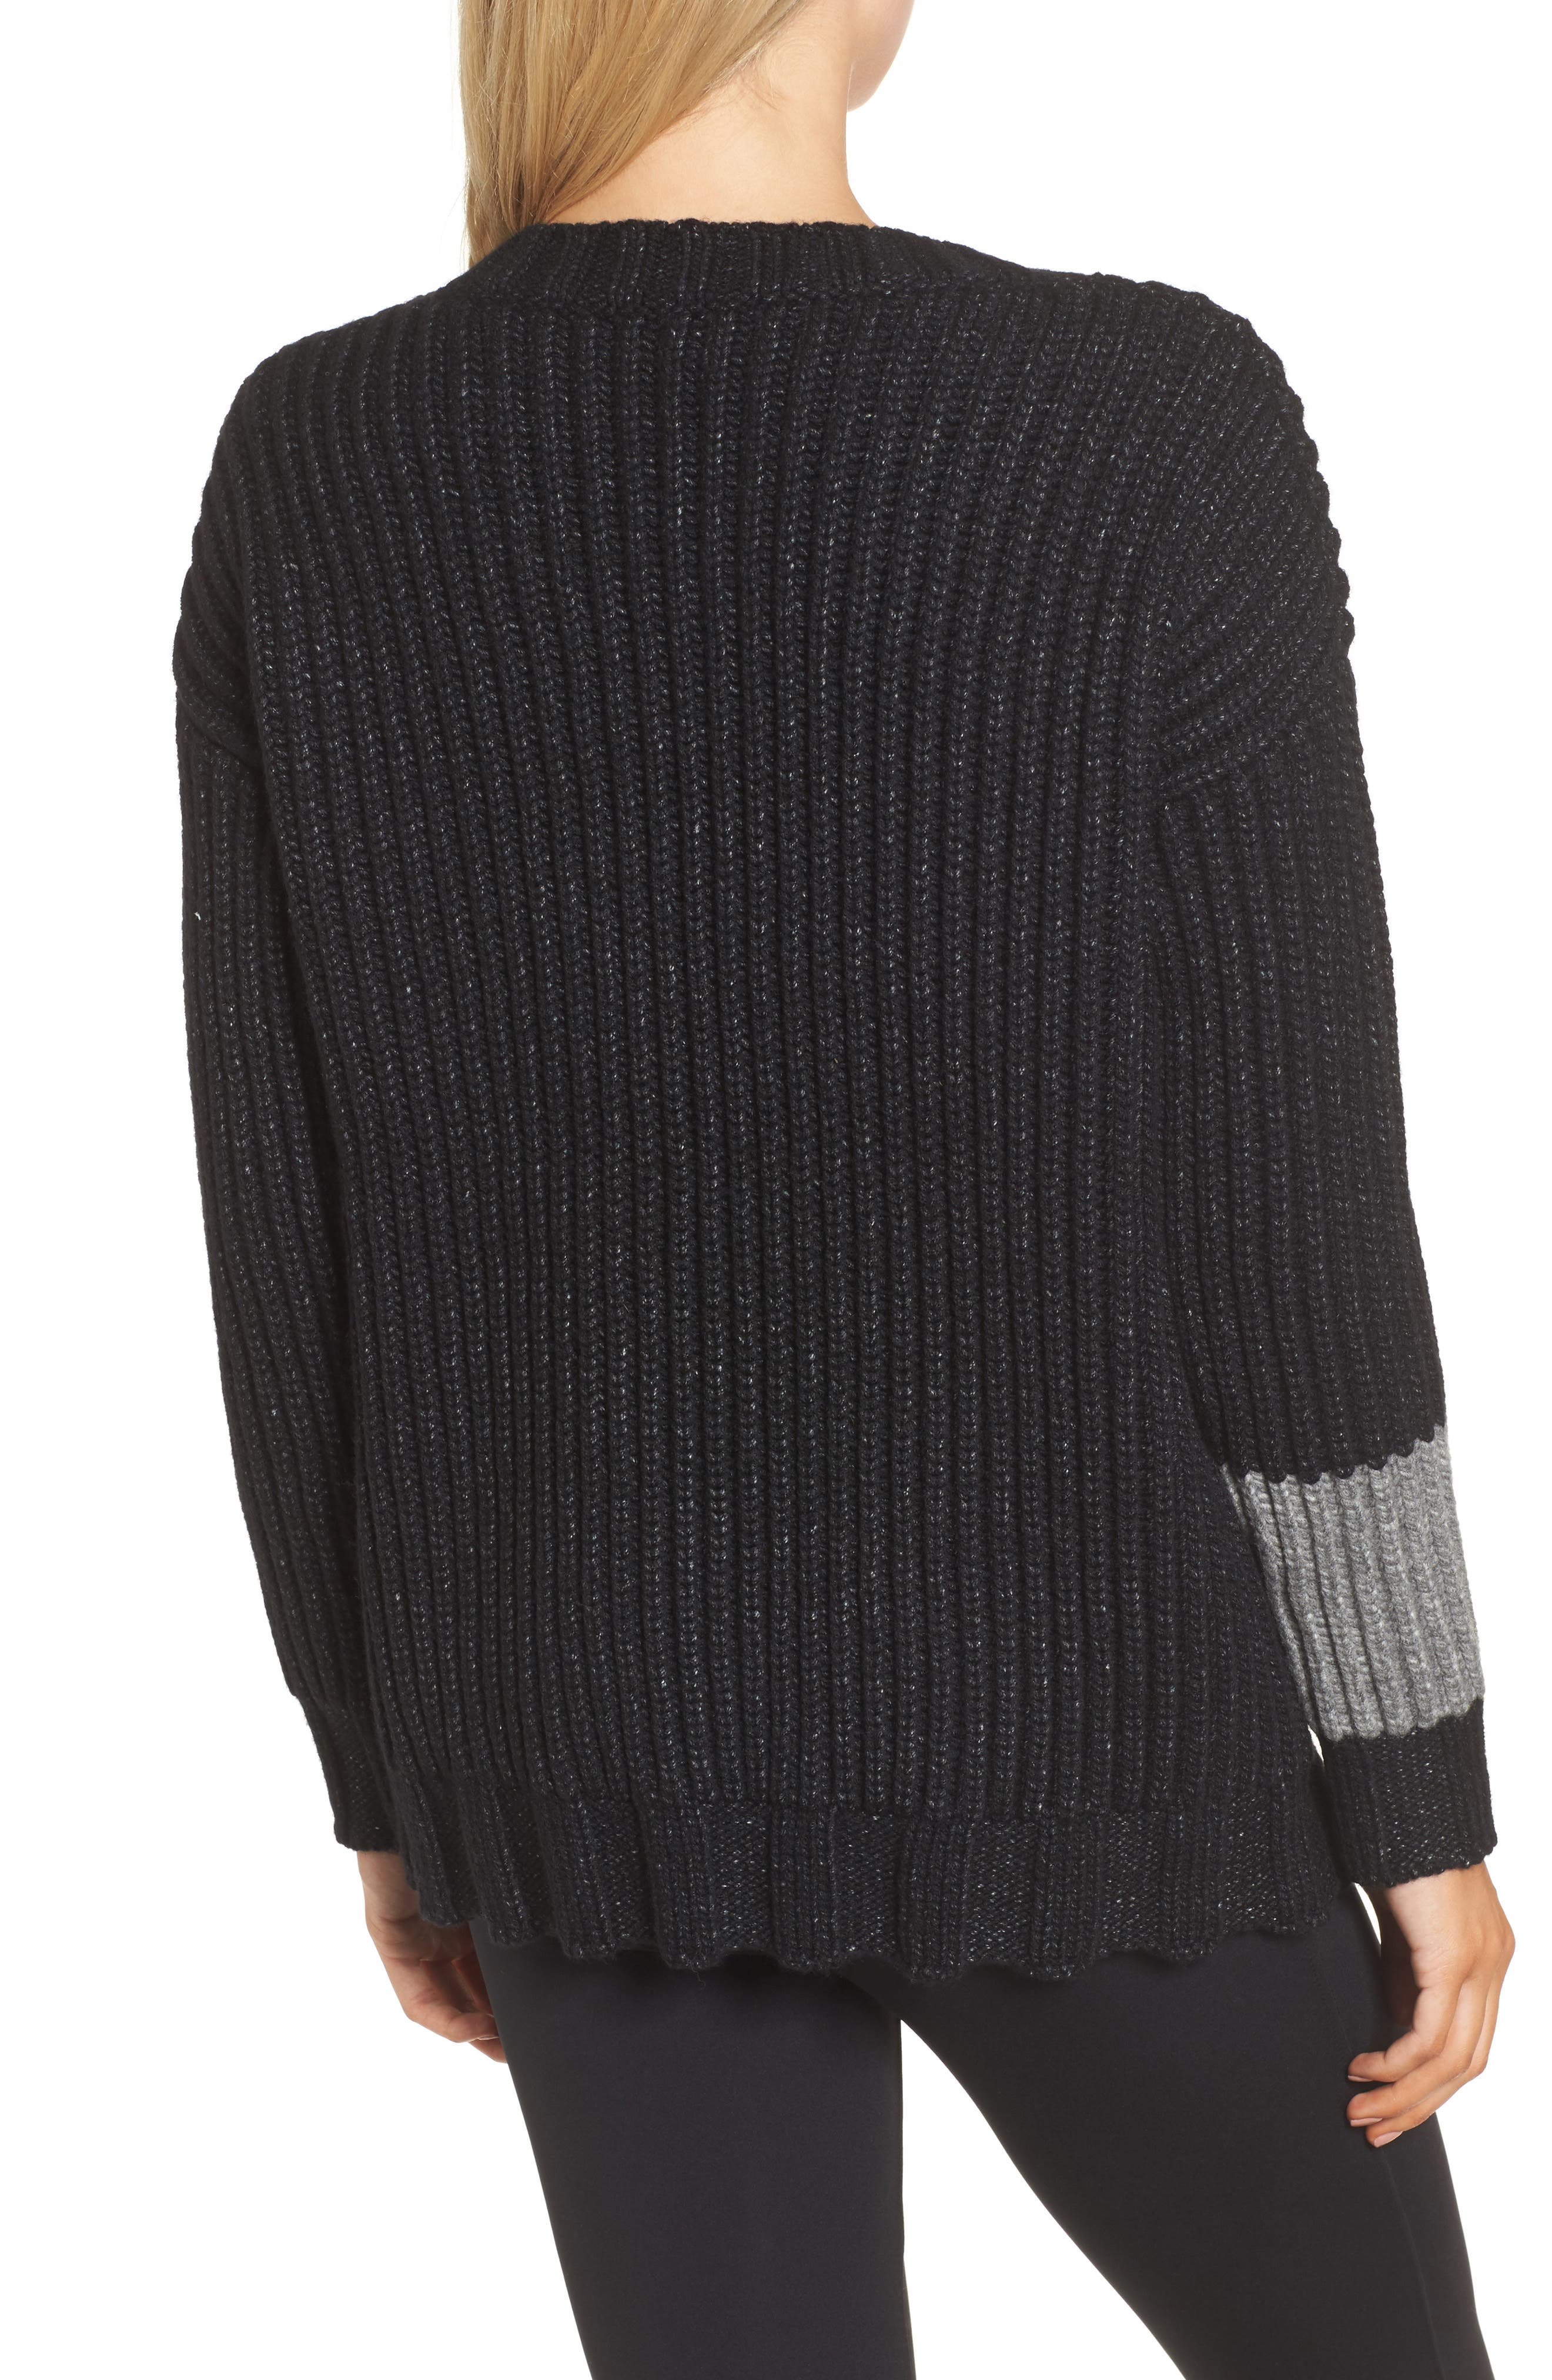 Chunky Armband Sweater,                             Alternate thumbnail 2, color,                             008